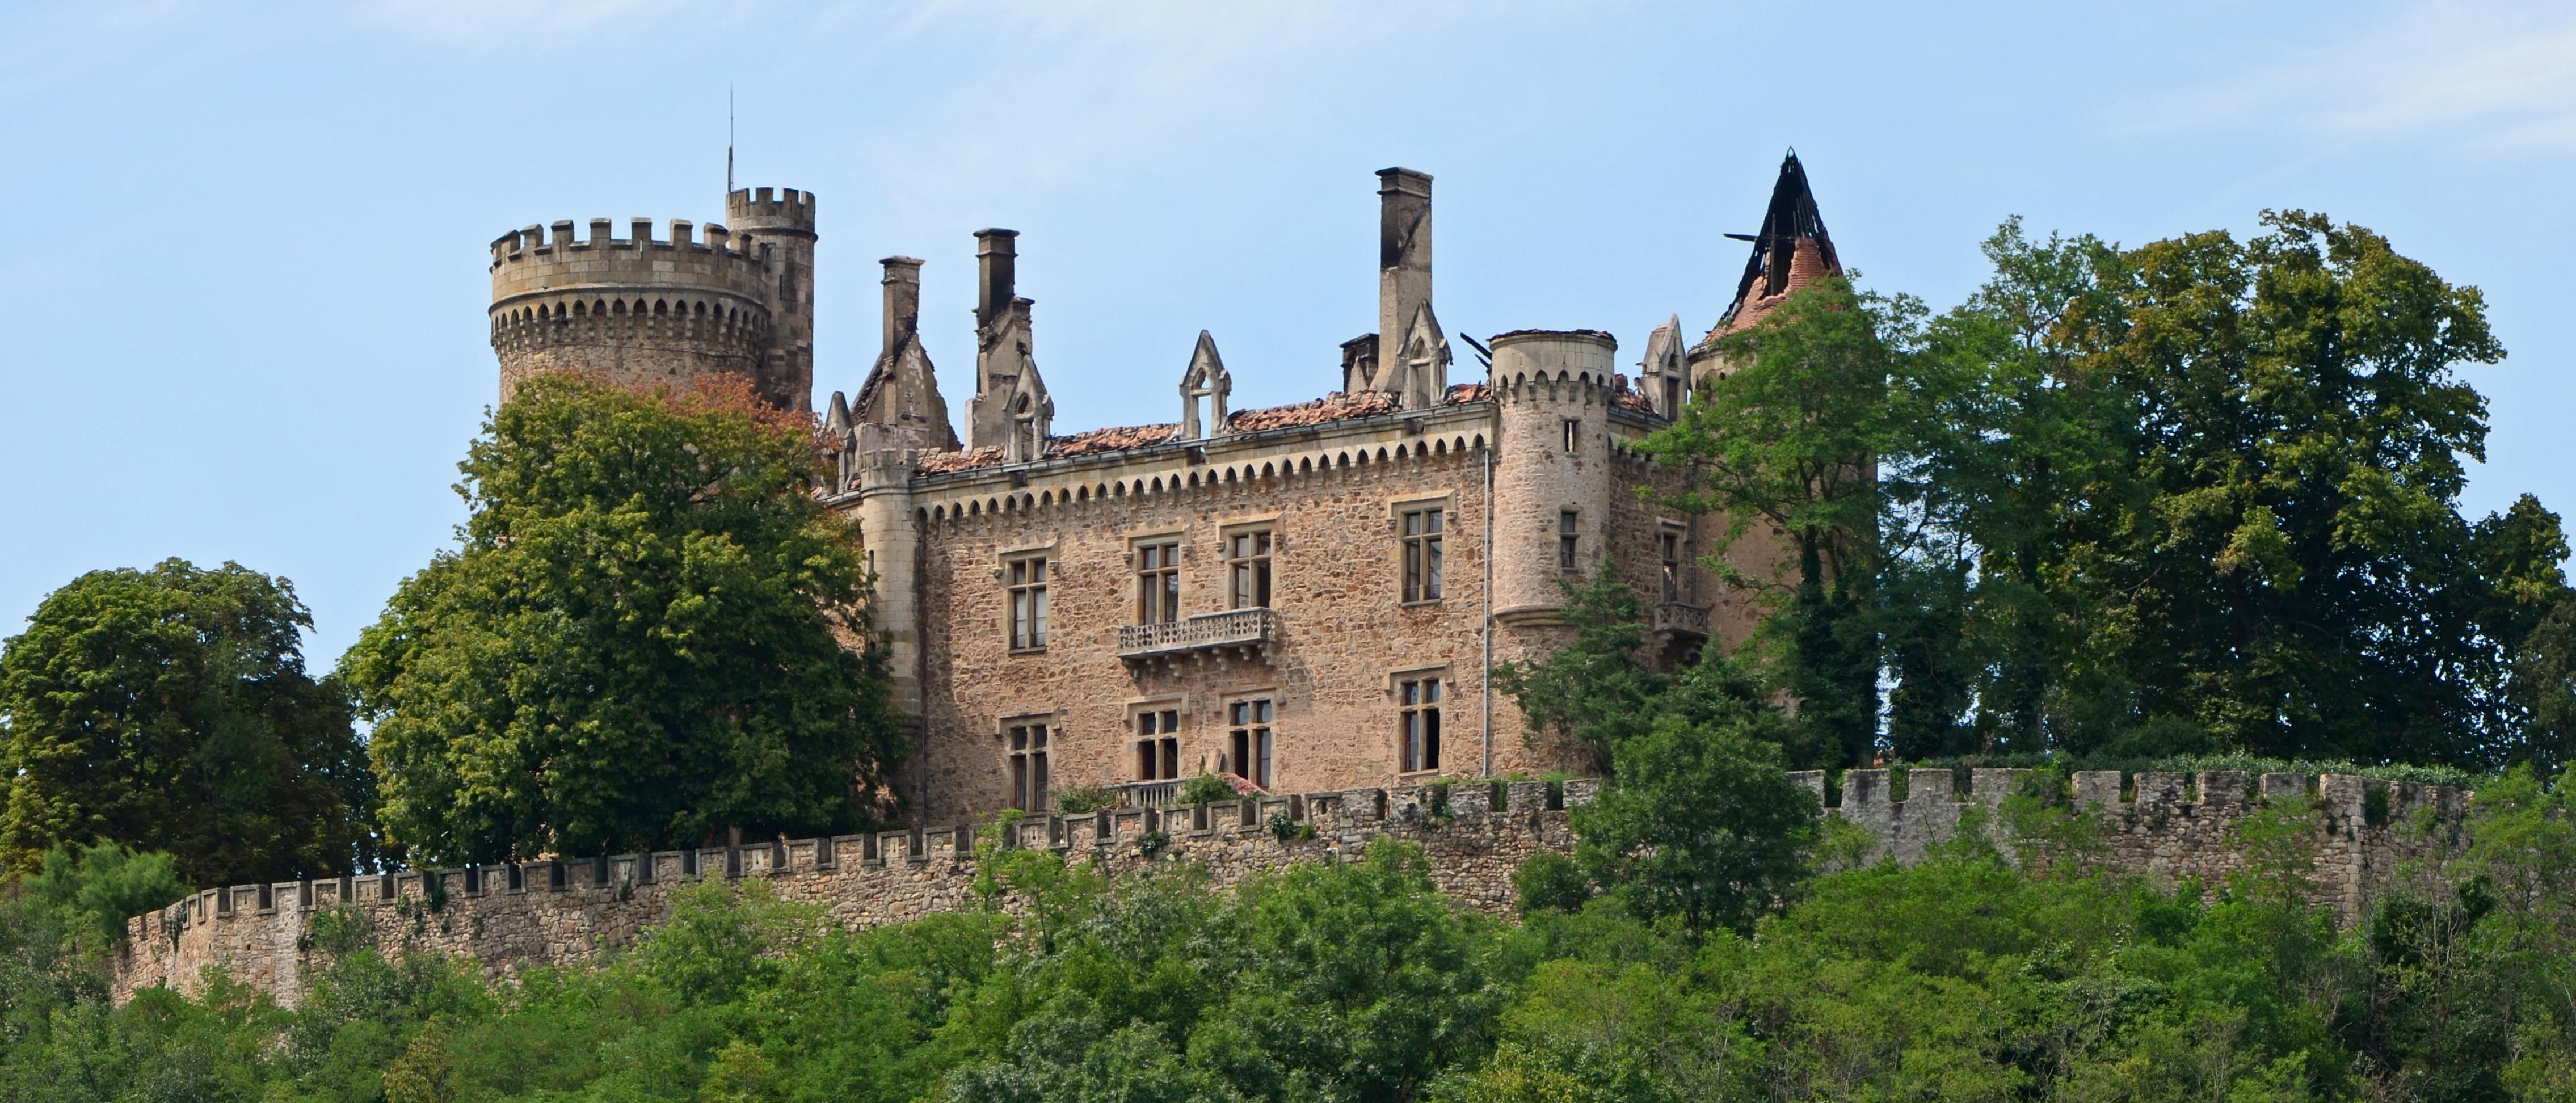 Chateau En Ruine A Restaurer Saint Piereville Ard Ef Bf Bdche